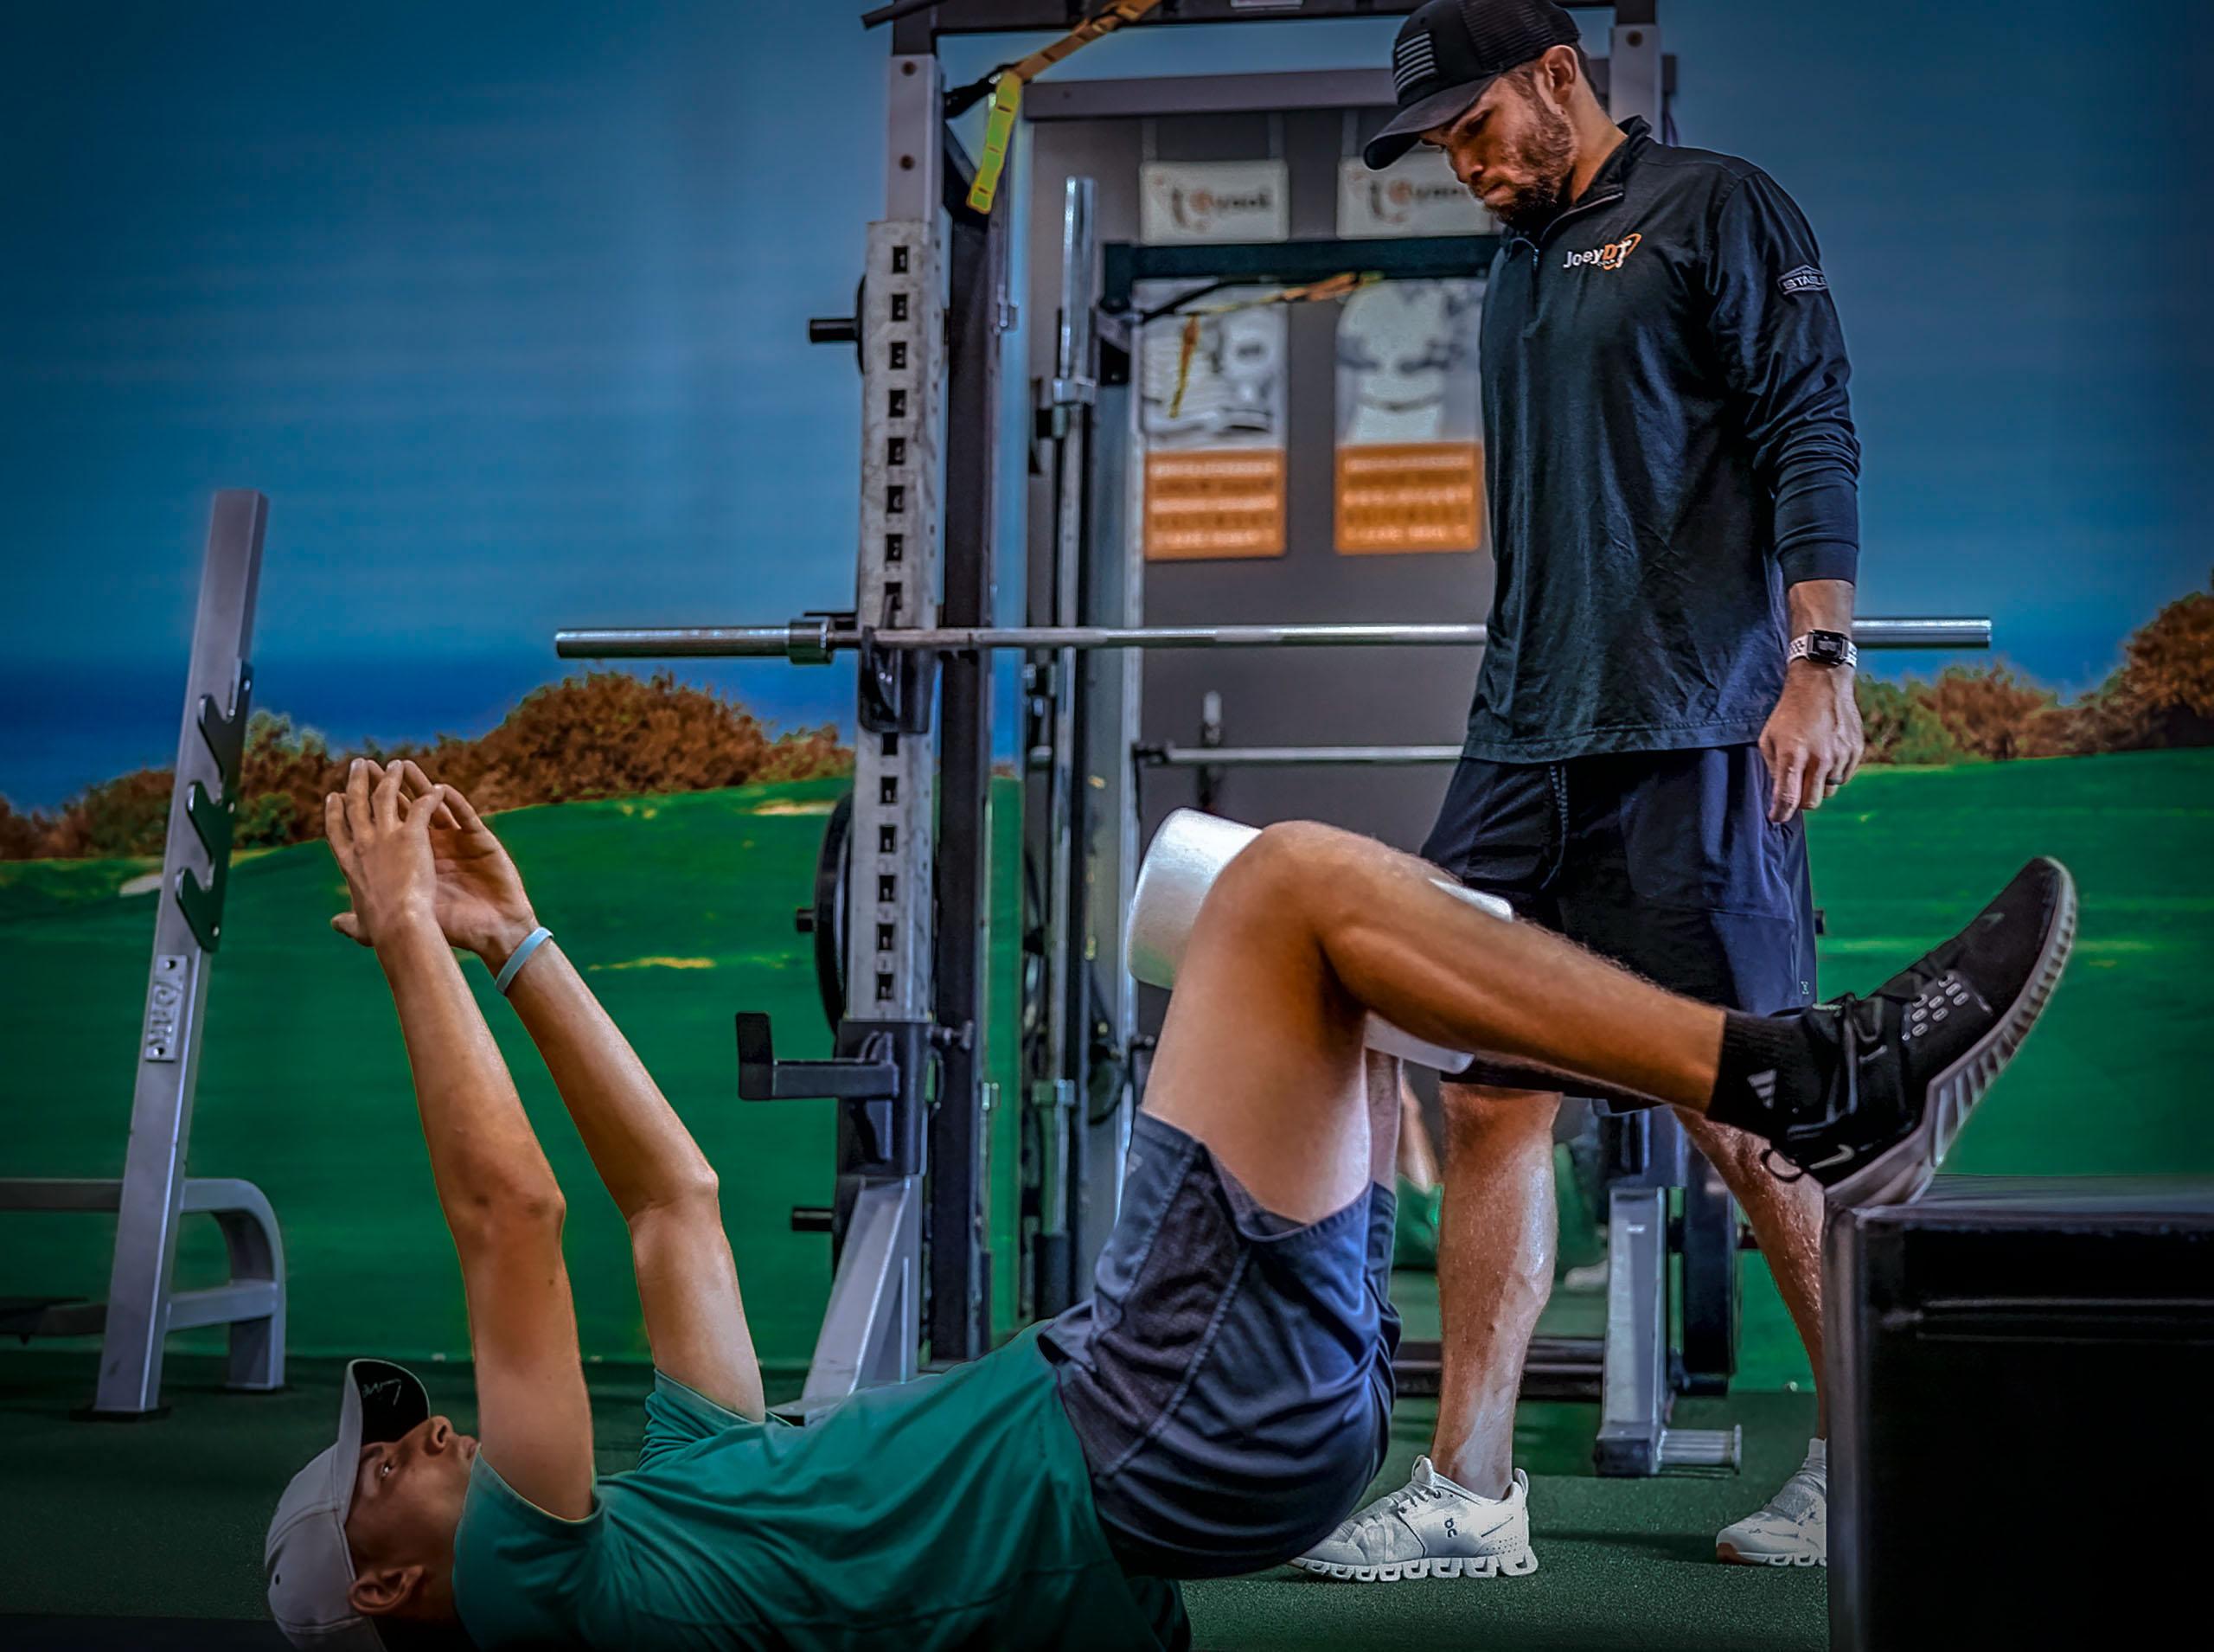 golf-workout-program-joeyd